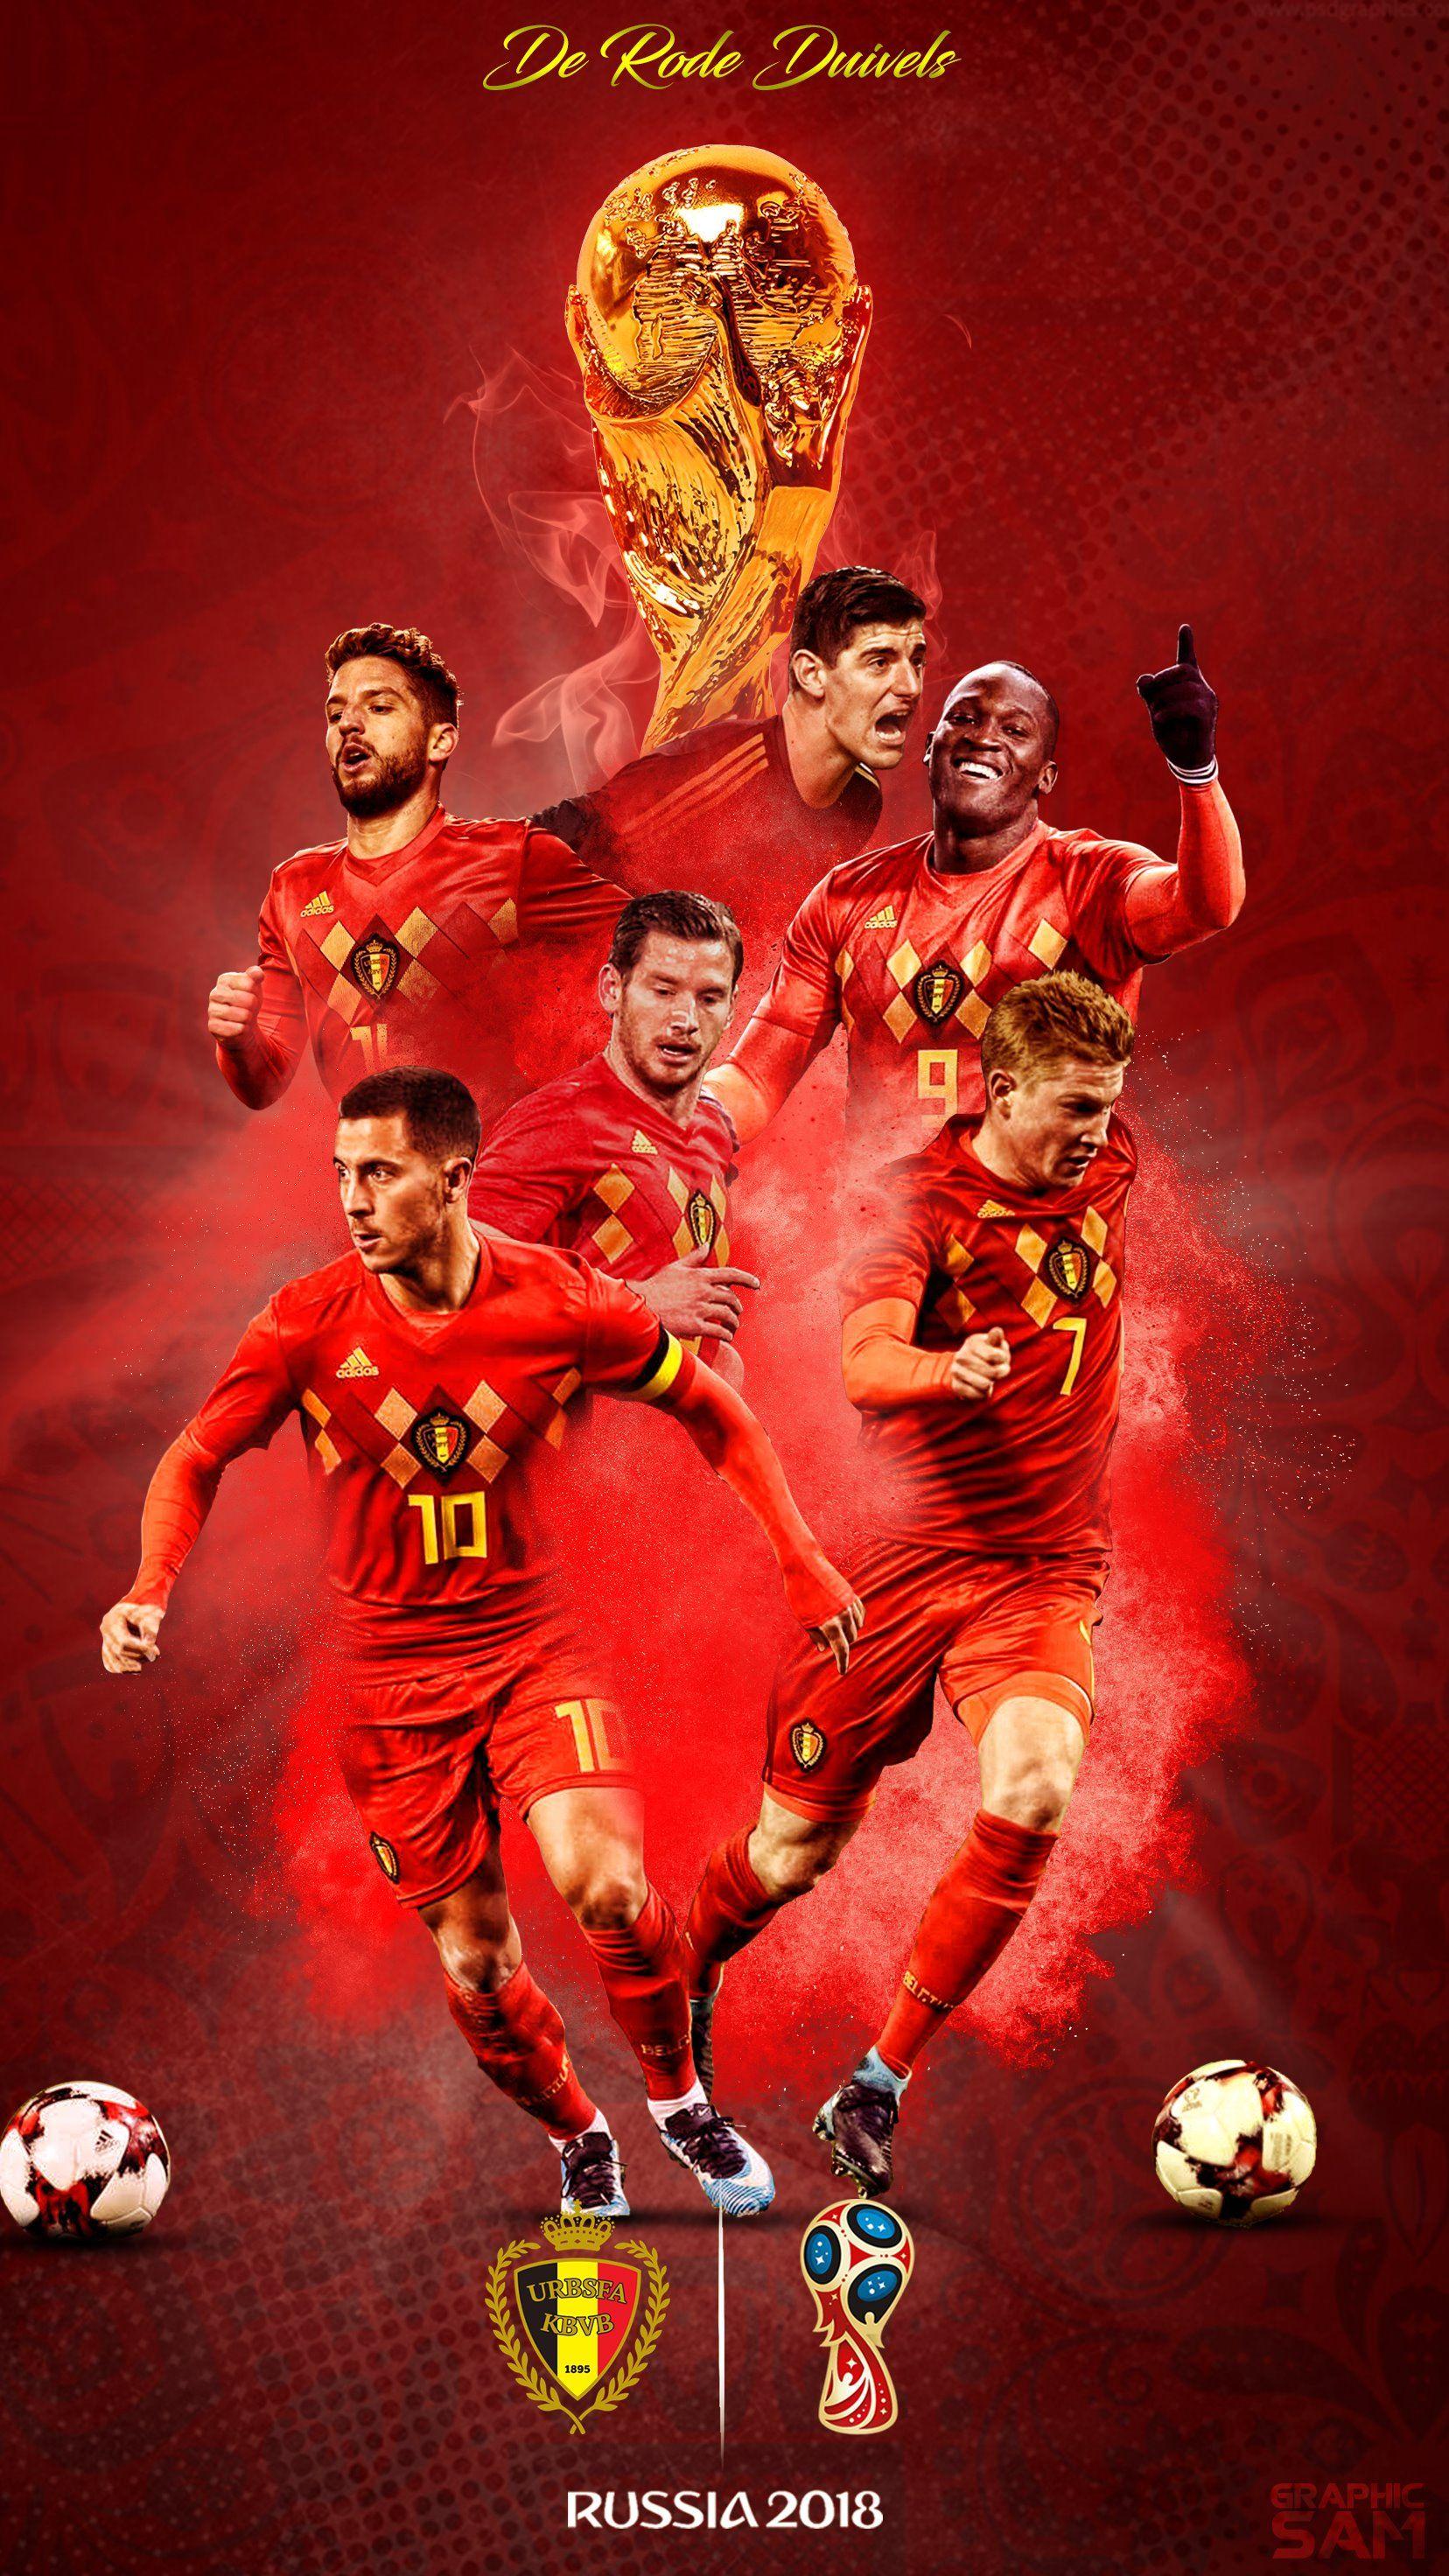 Worldcup Belgium National Football Team Iran National Football Team Spain National Football Team